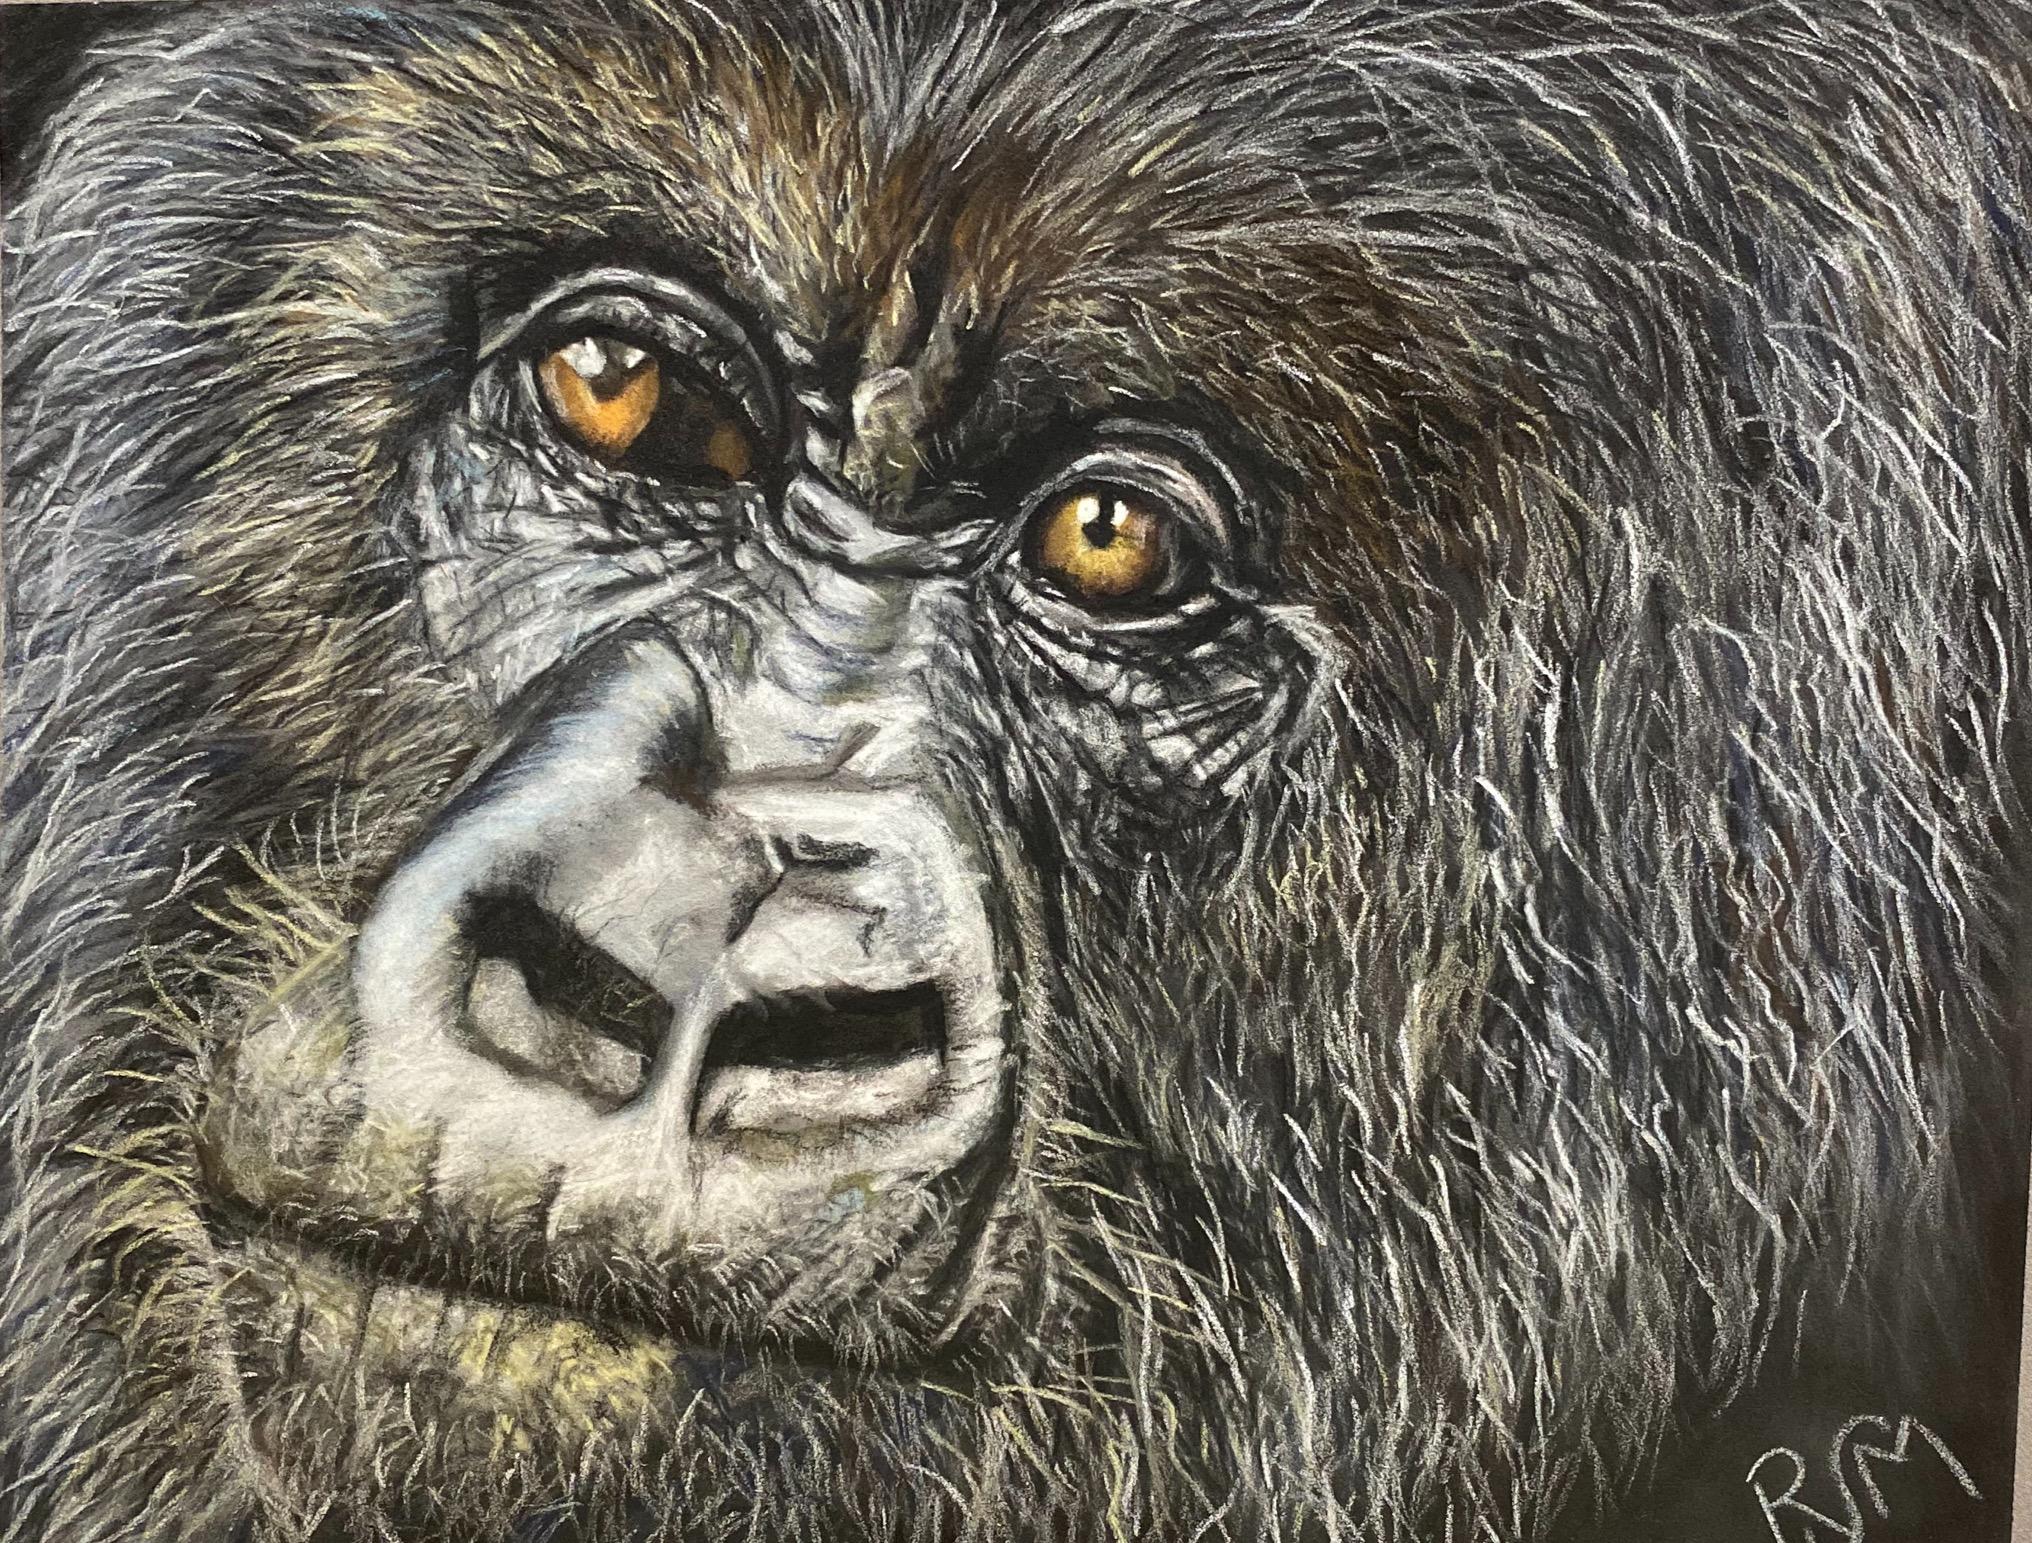 Mummy Gorilla